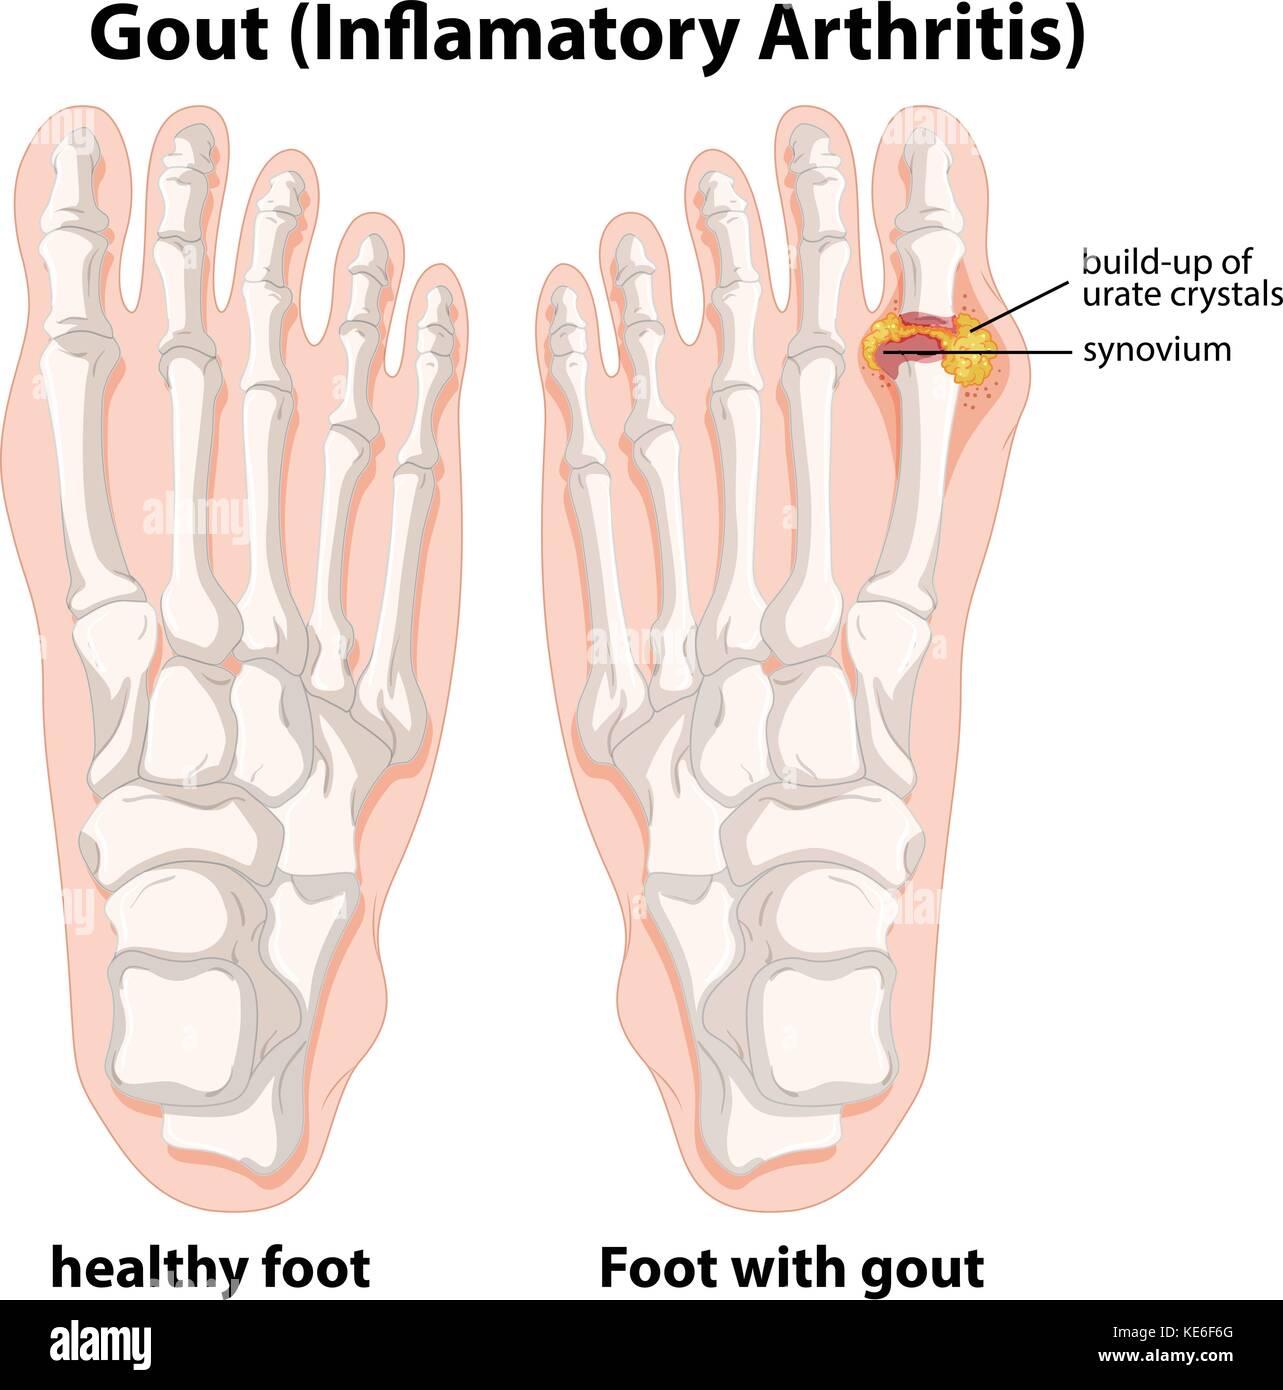 diagram of foot stock photos \u0026 diagram of foot stock images alamy Prosthetic Foot Diagram diagram explanation of gout in human foot illustration stock image